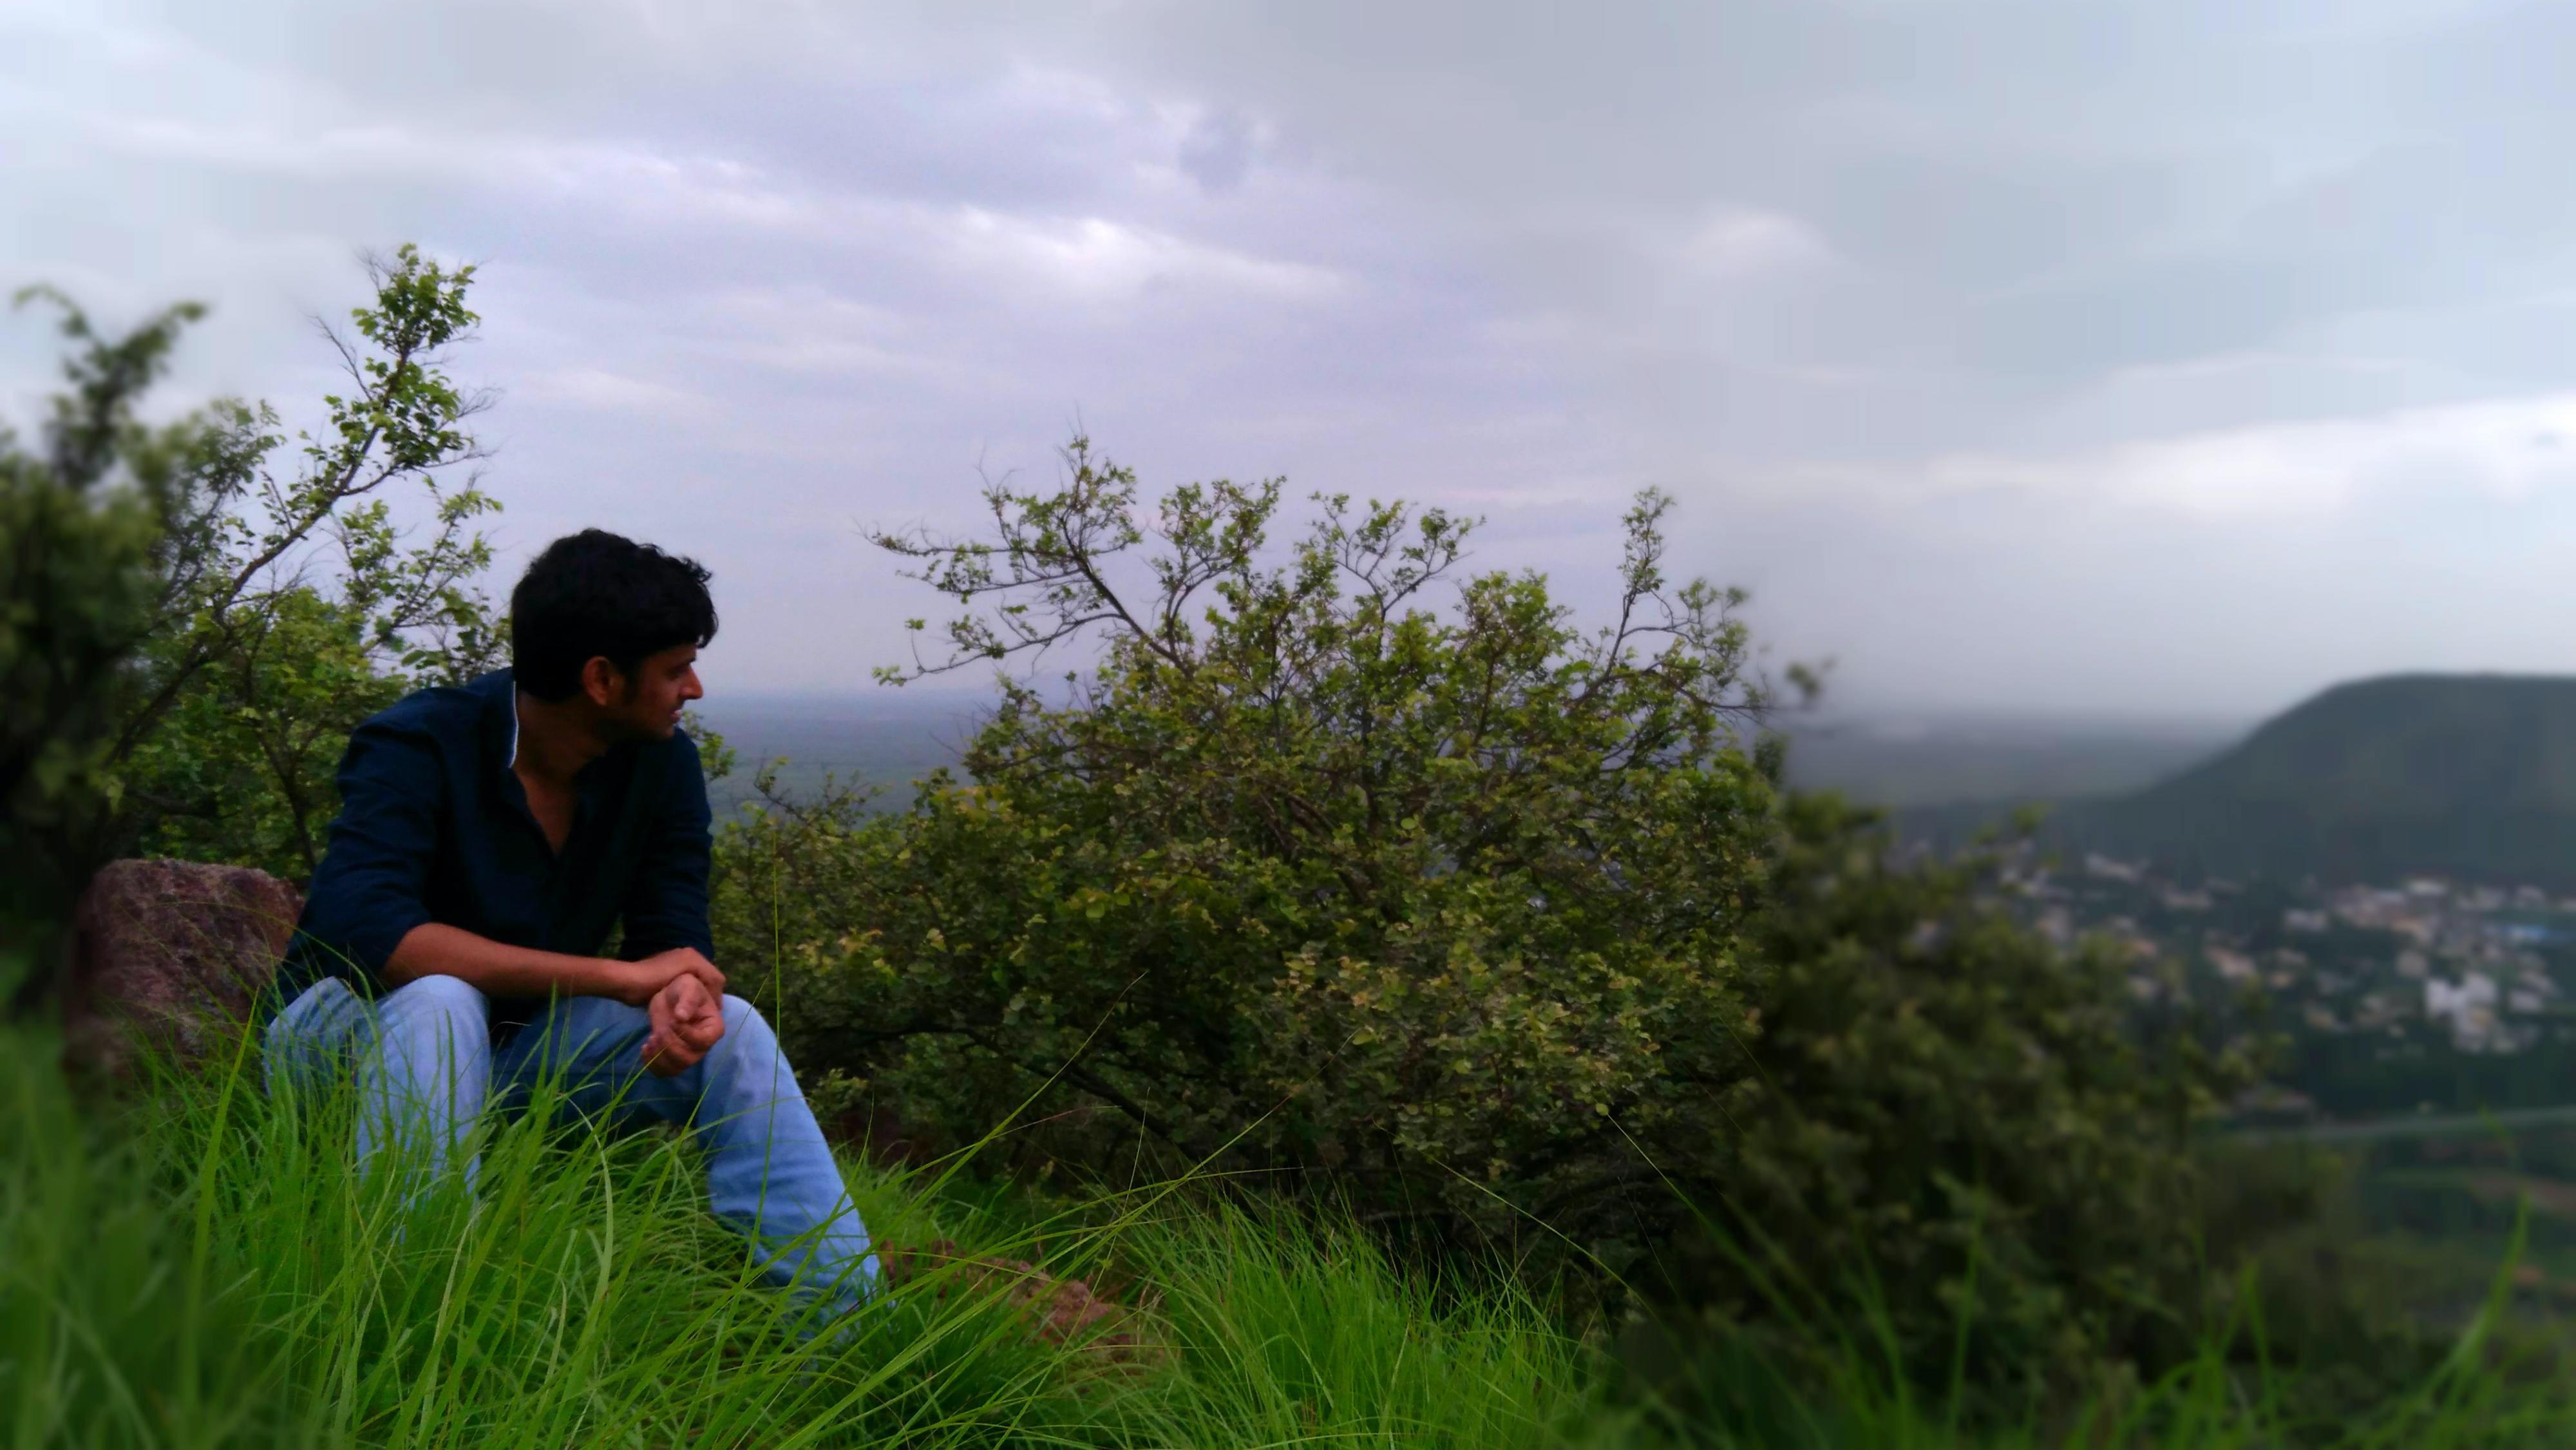 Go to eswar pandiripalli's profile